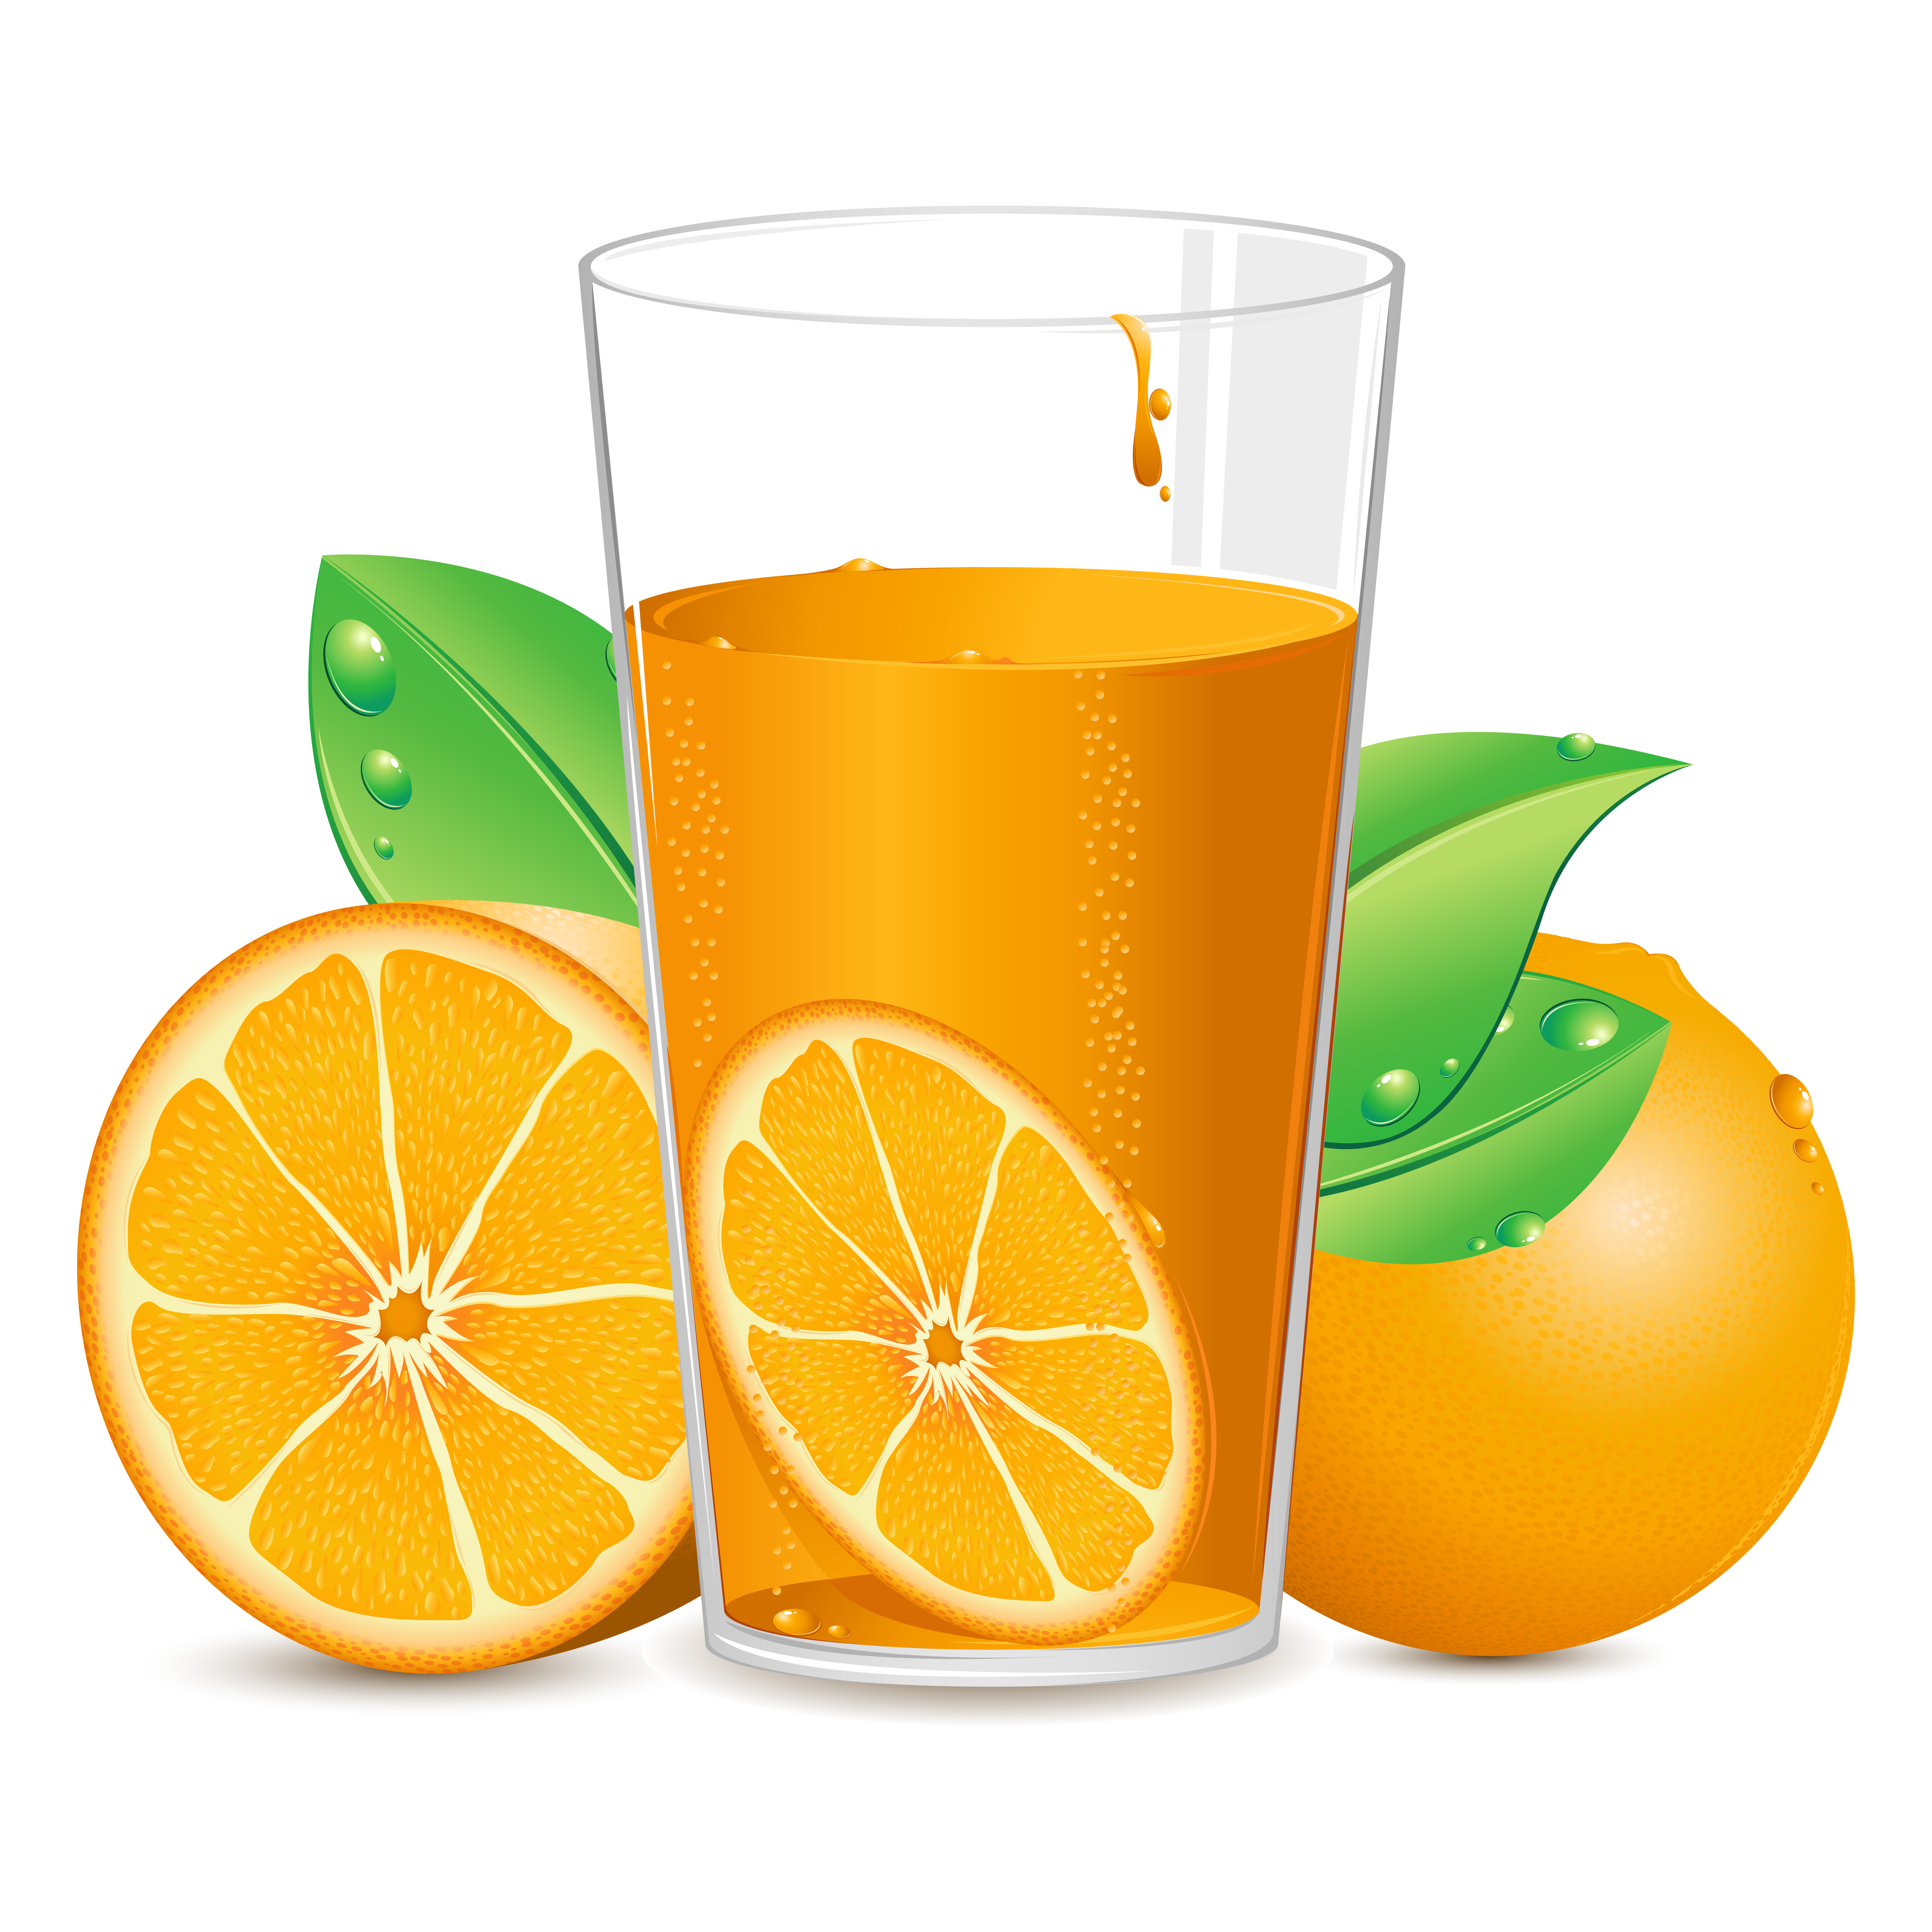 Suco de laranja.